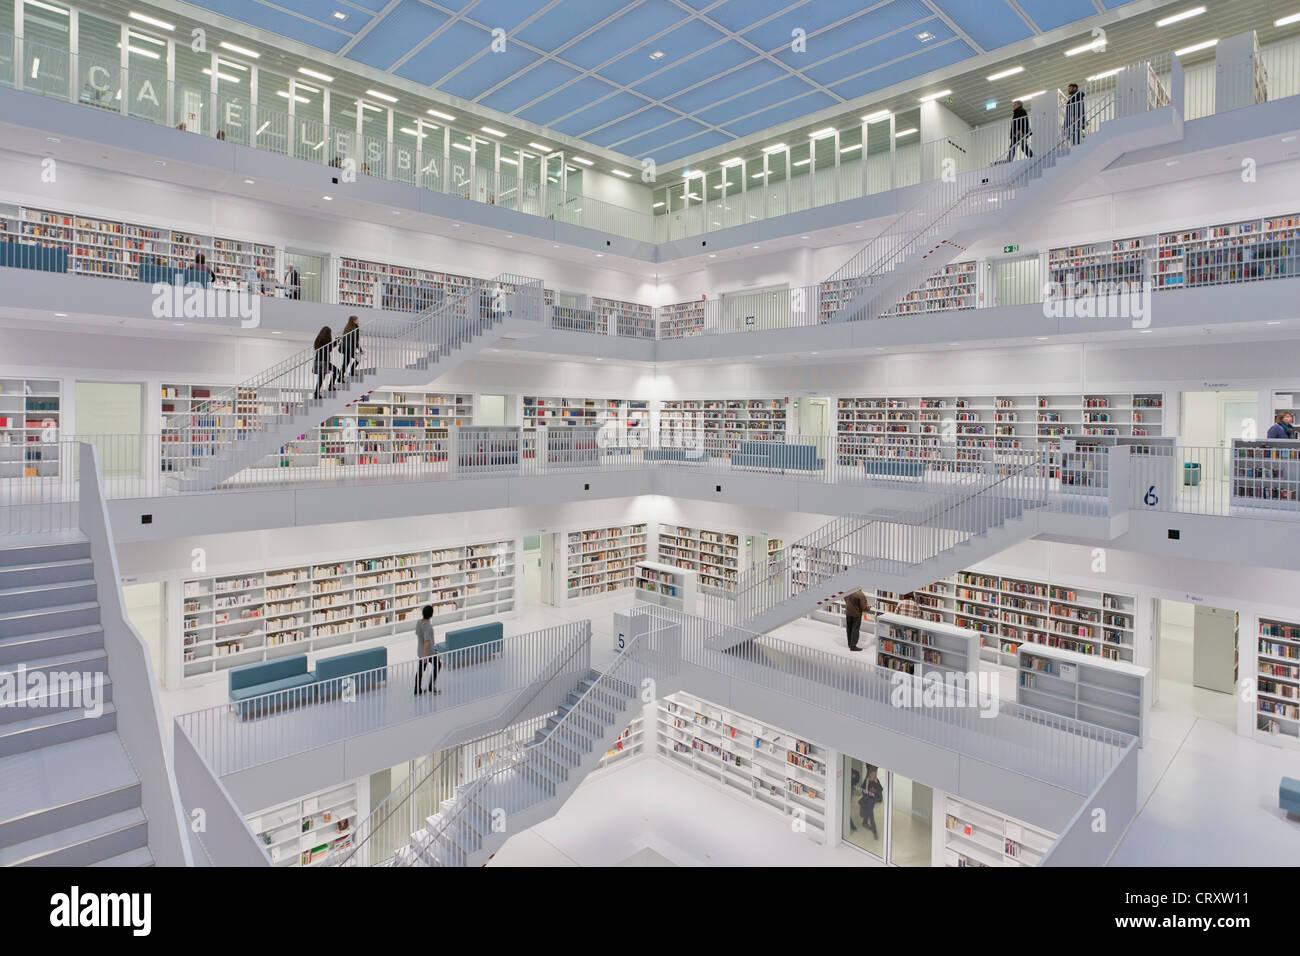 germany baden wuerttemberg stuttgart stadtbibliothek am mailander stockfoto lizenzfreies. Black Bedroom Furniture Sets. Home Design Ideas